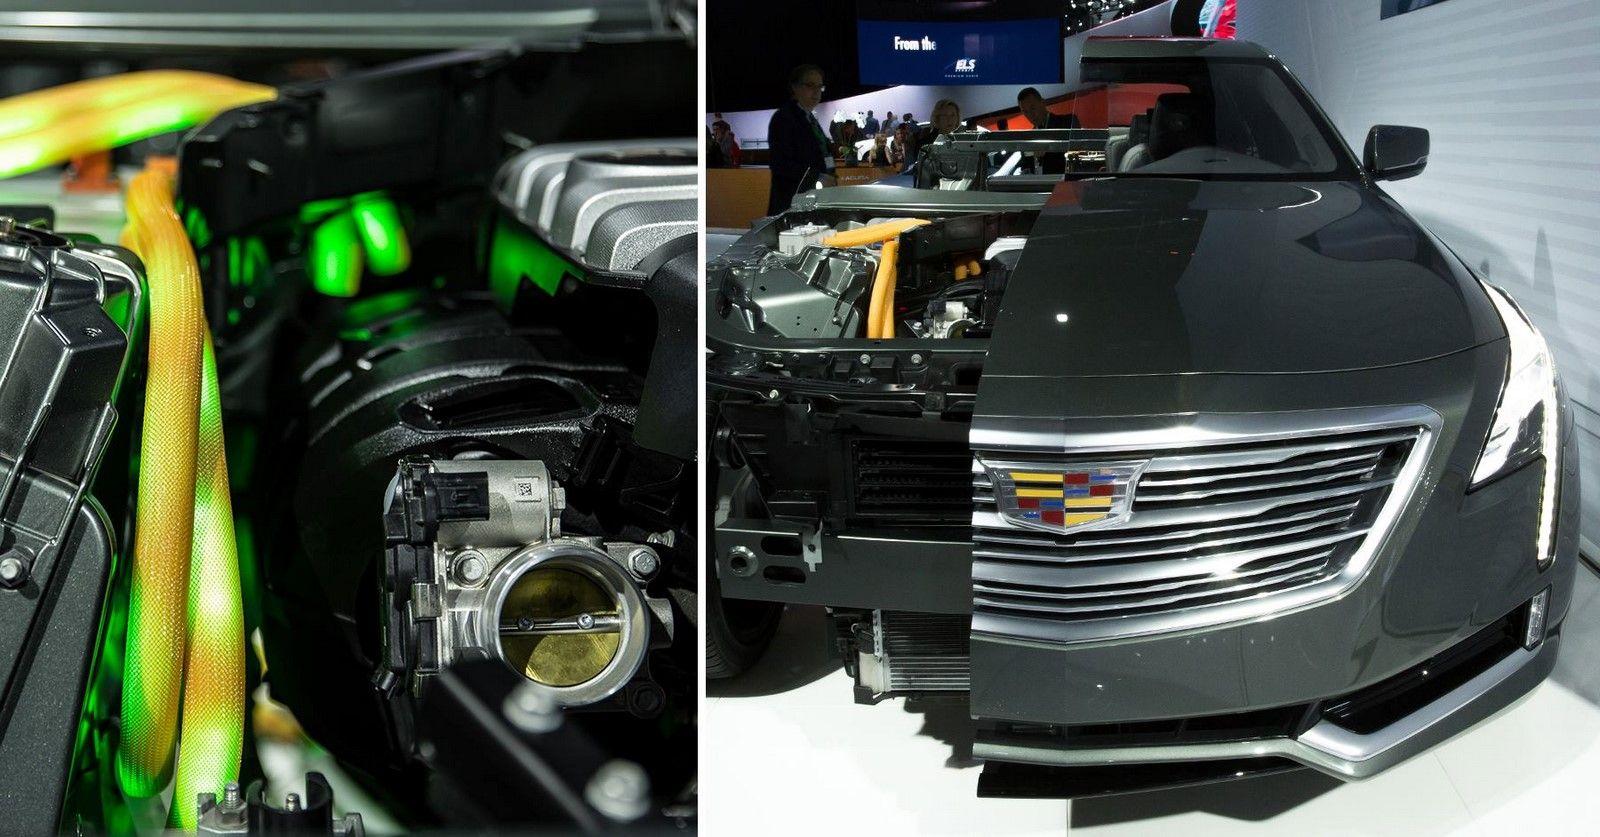 2017 Cadillac Ct6 Plug In Hybrid Makes North American Debut